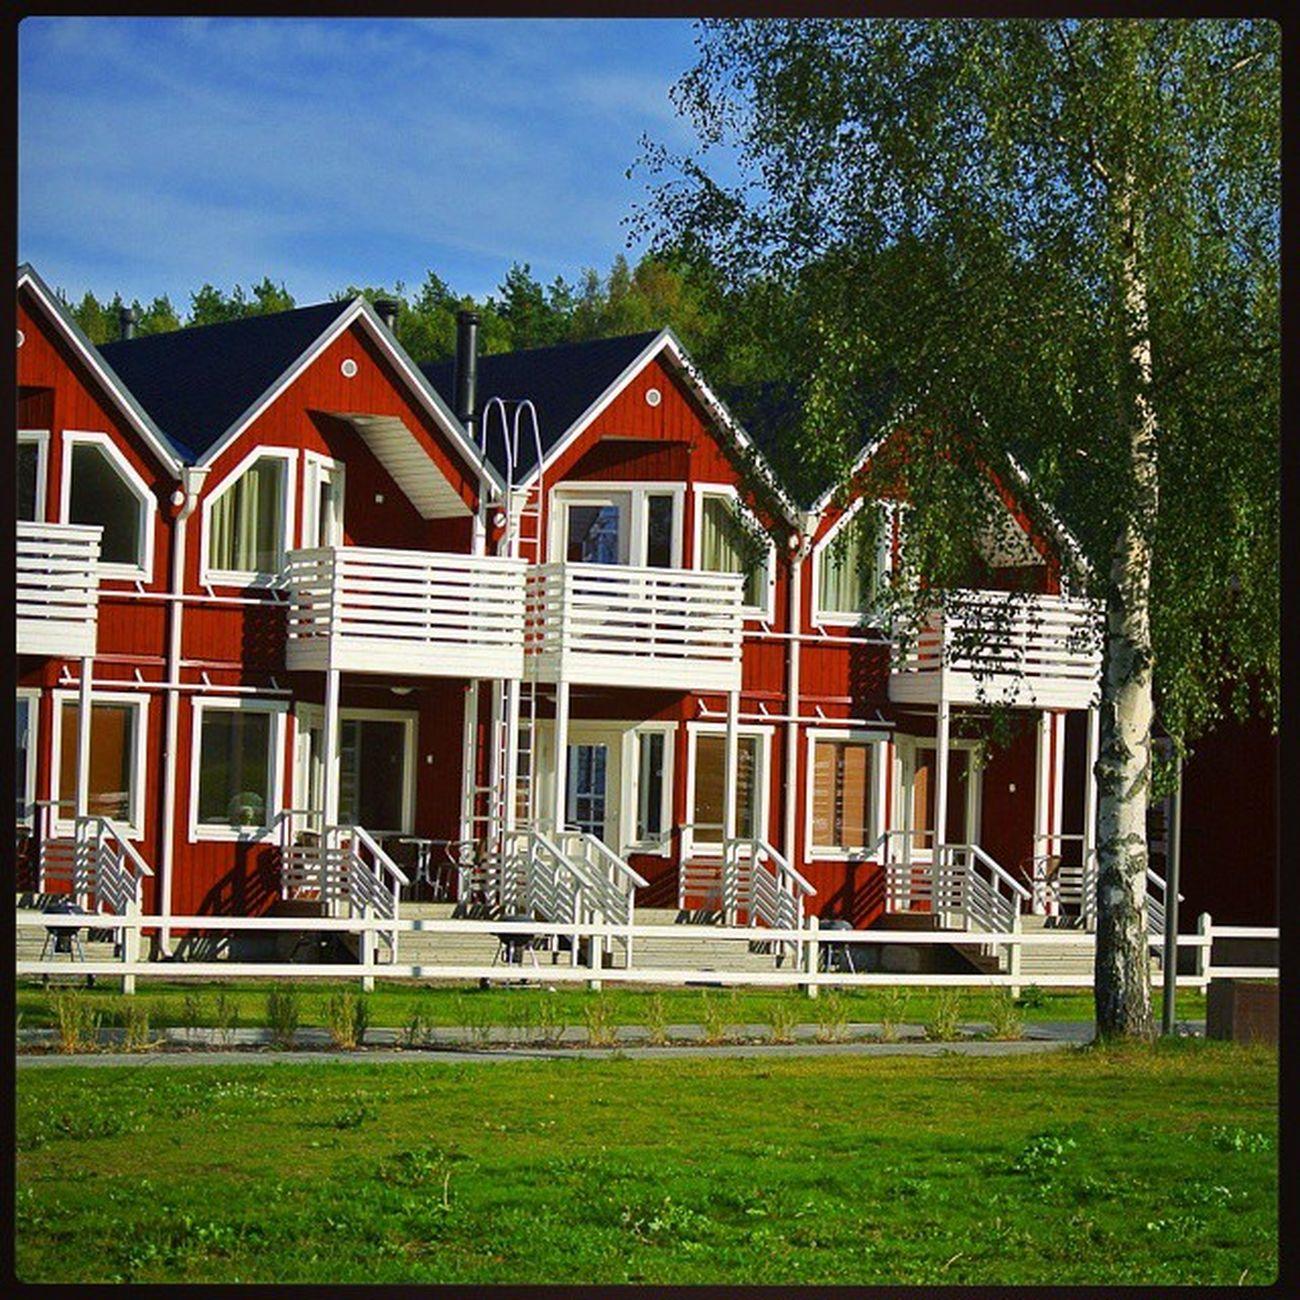 Finland House Tree Rauha Suomi дом дерево Рауха Финляндия